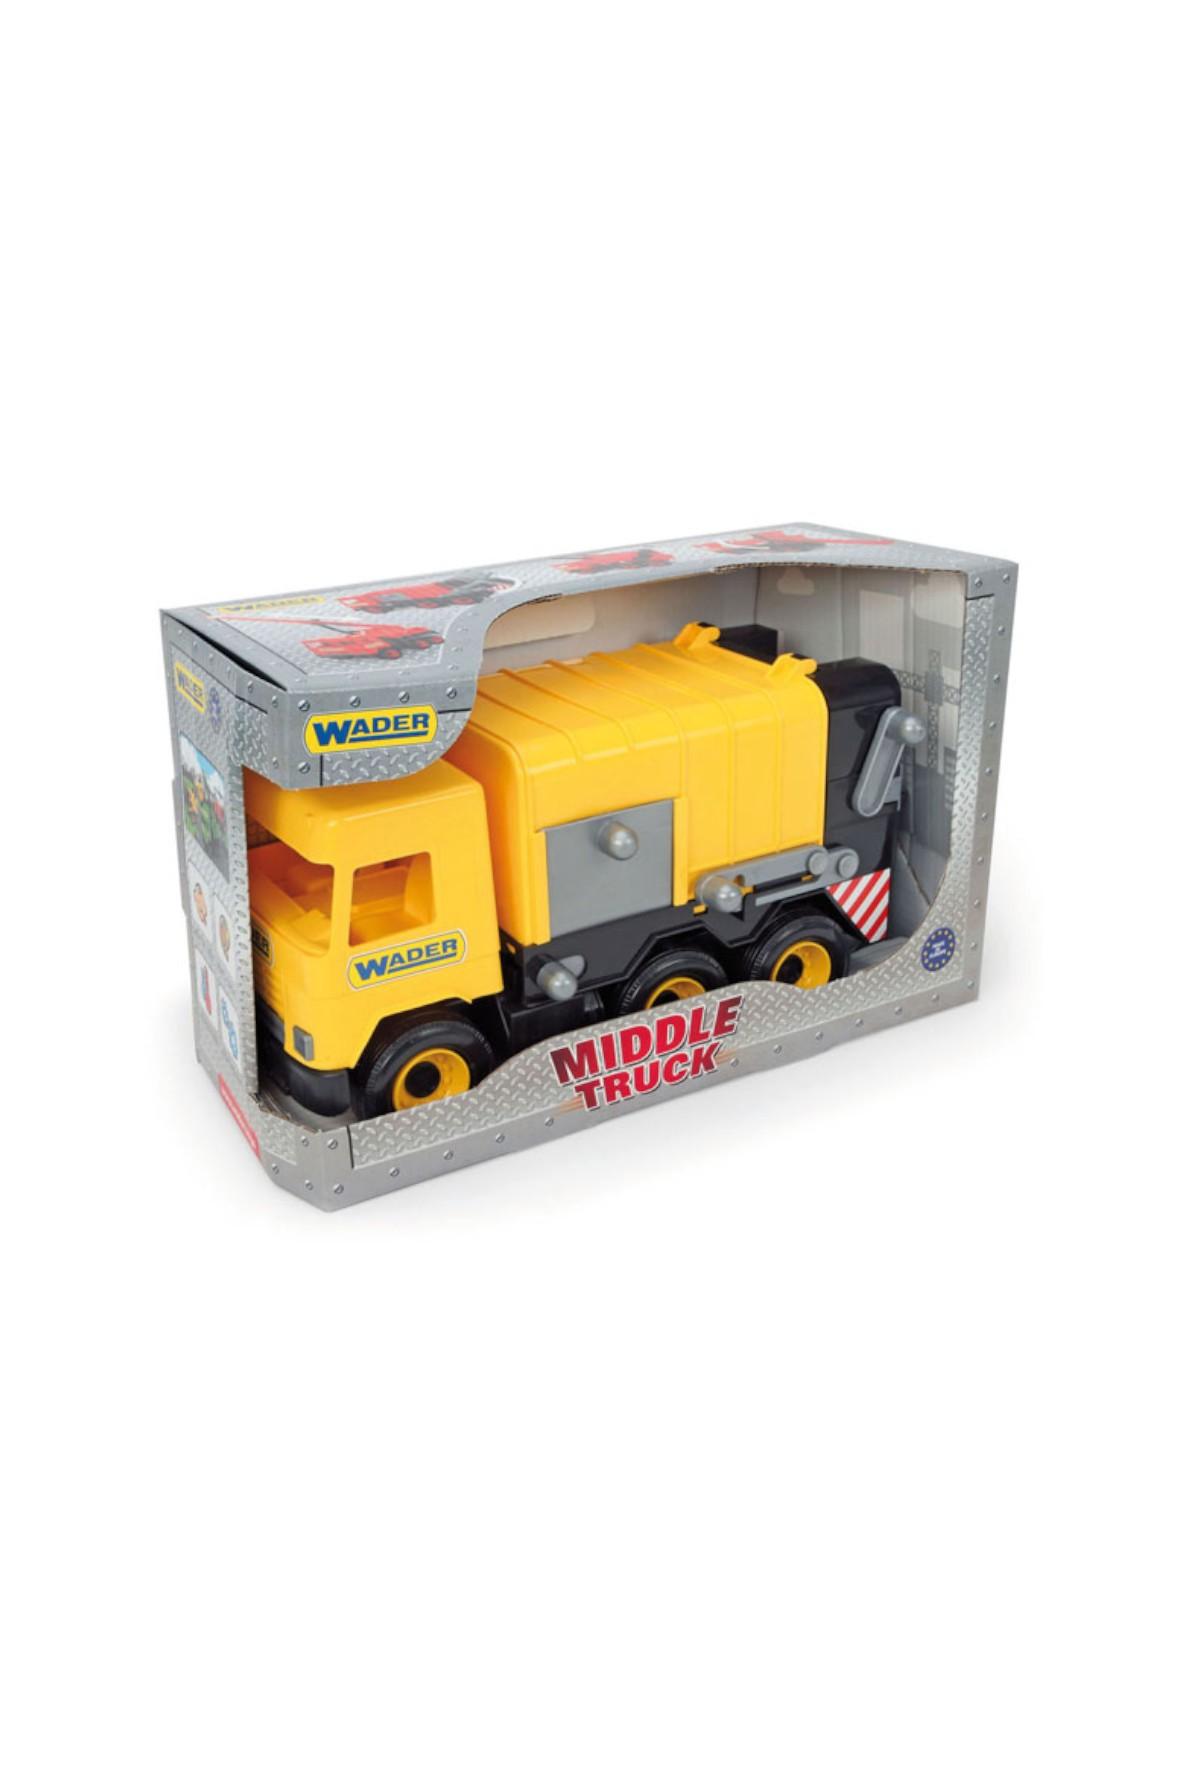 Middle Truck śmieciarka żółta